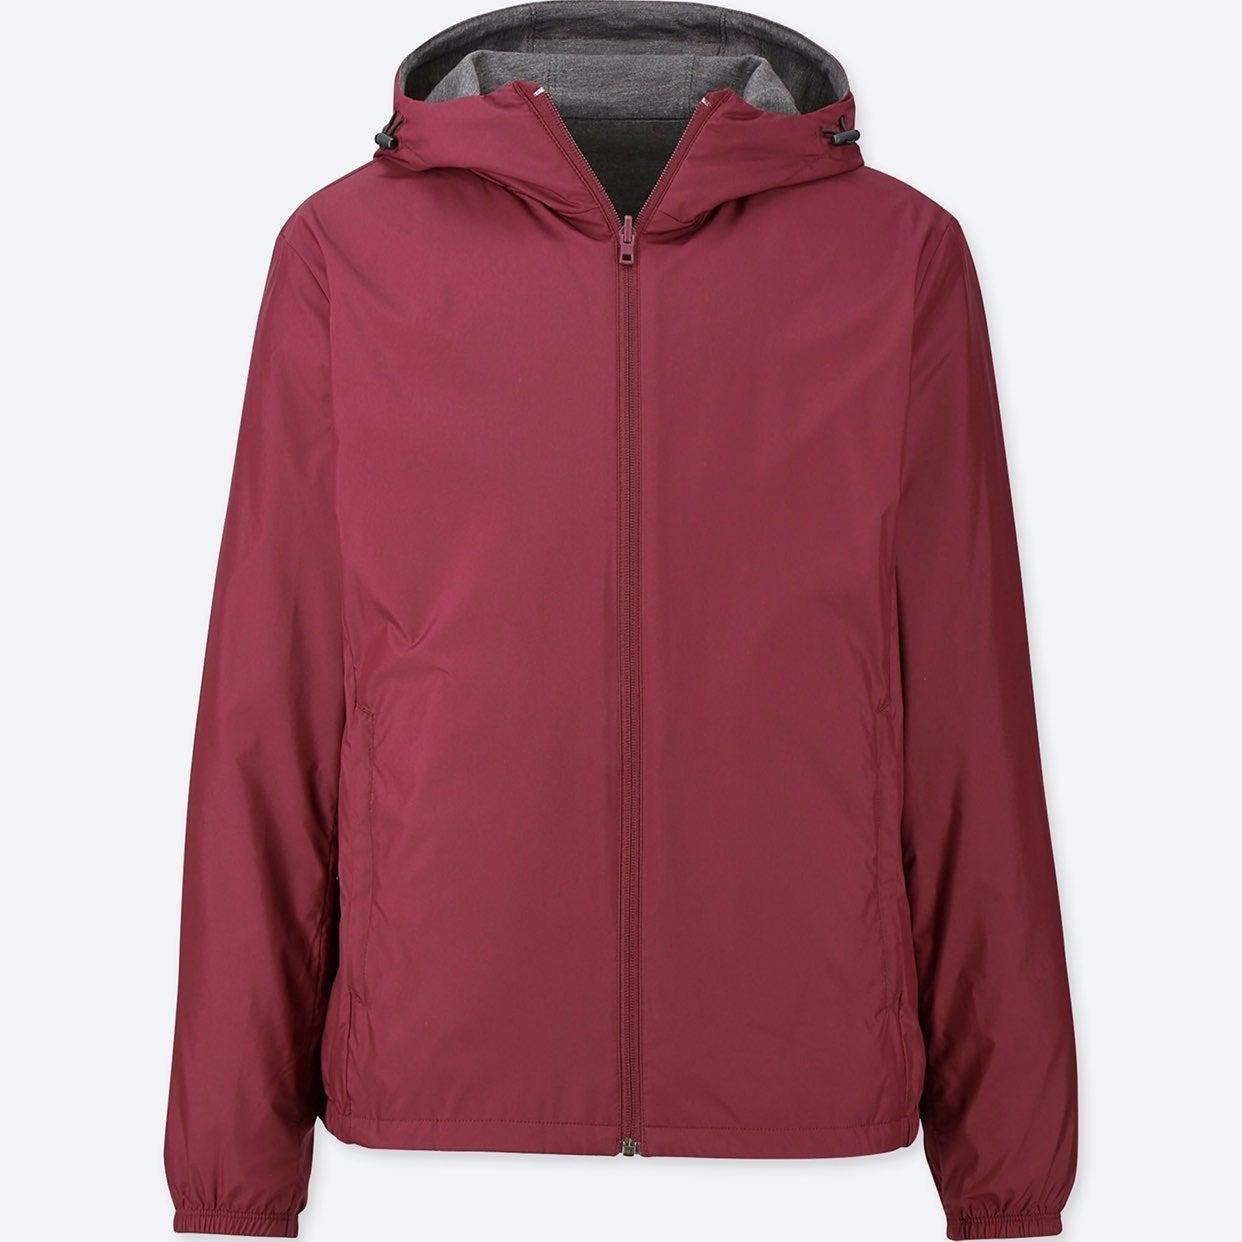 Uniqlo Reversible Jacket (Women's)